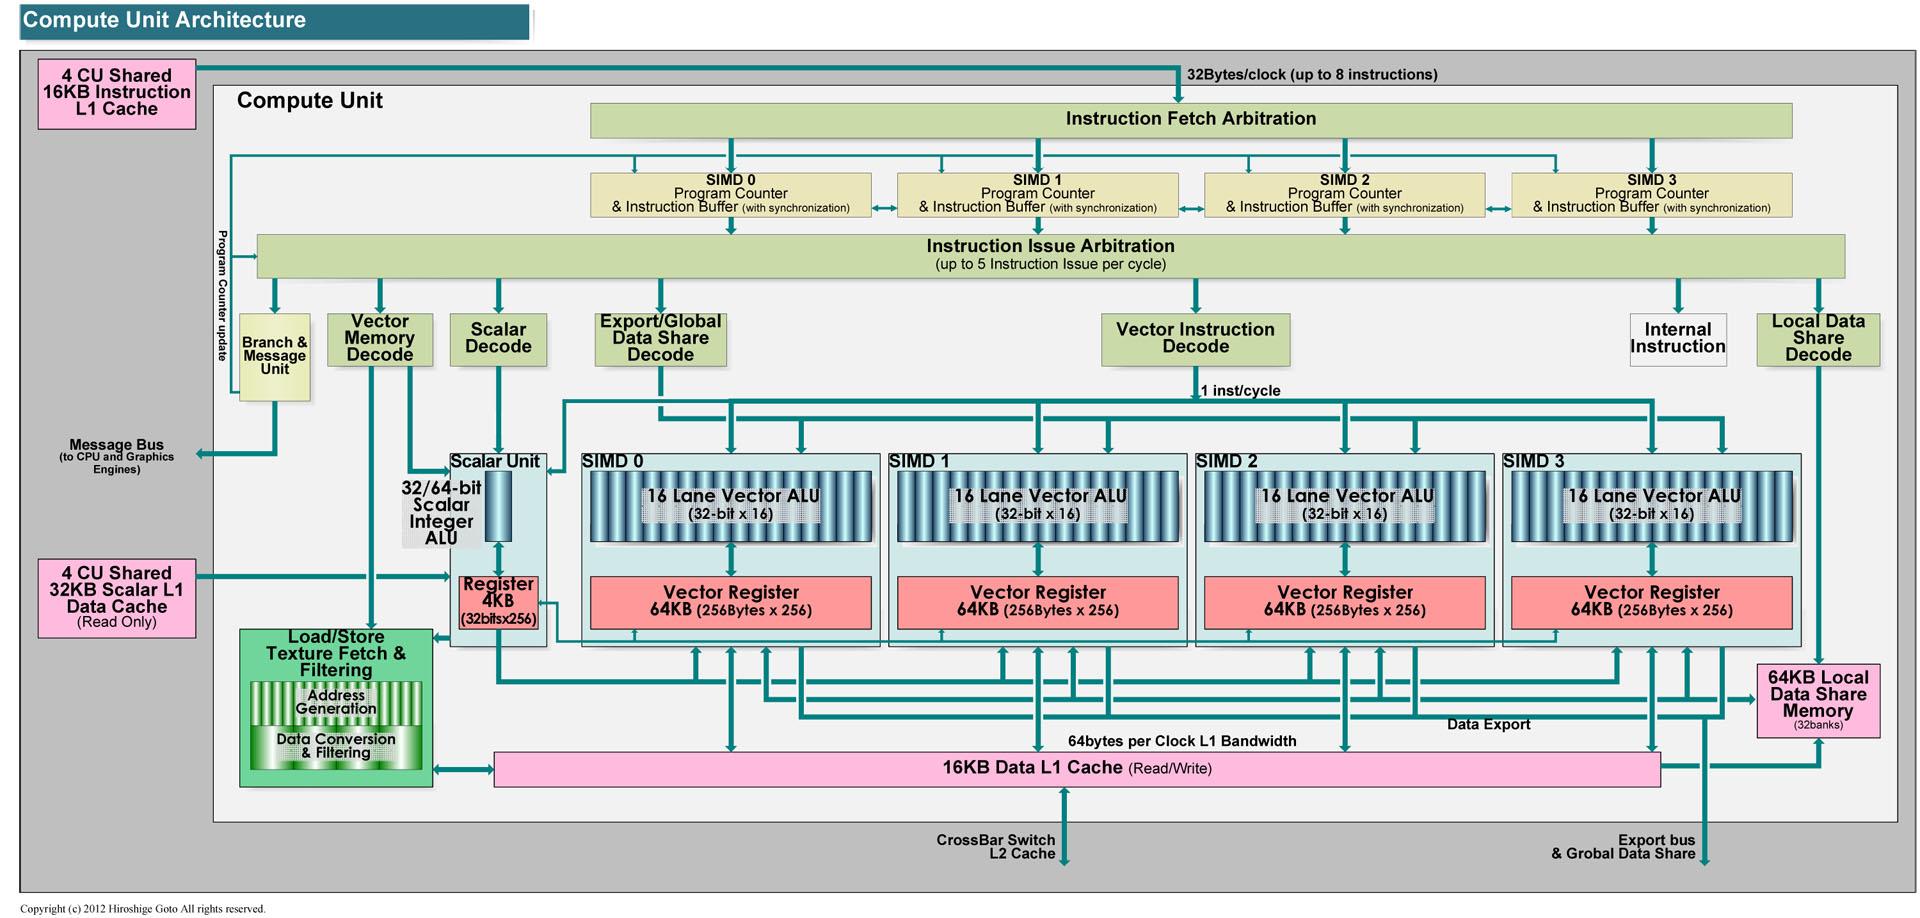 "Graphics Core Nextのコンピュートユニット(PDF版は<span class=""img-inline raw""><a href=""/video/pcw/docs/588/797/p29.pdf"" ipw_status=""1"" ipw_linktype=""filelink_raw"" class=""resource"">こちら</a></span>)"